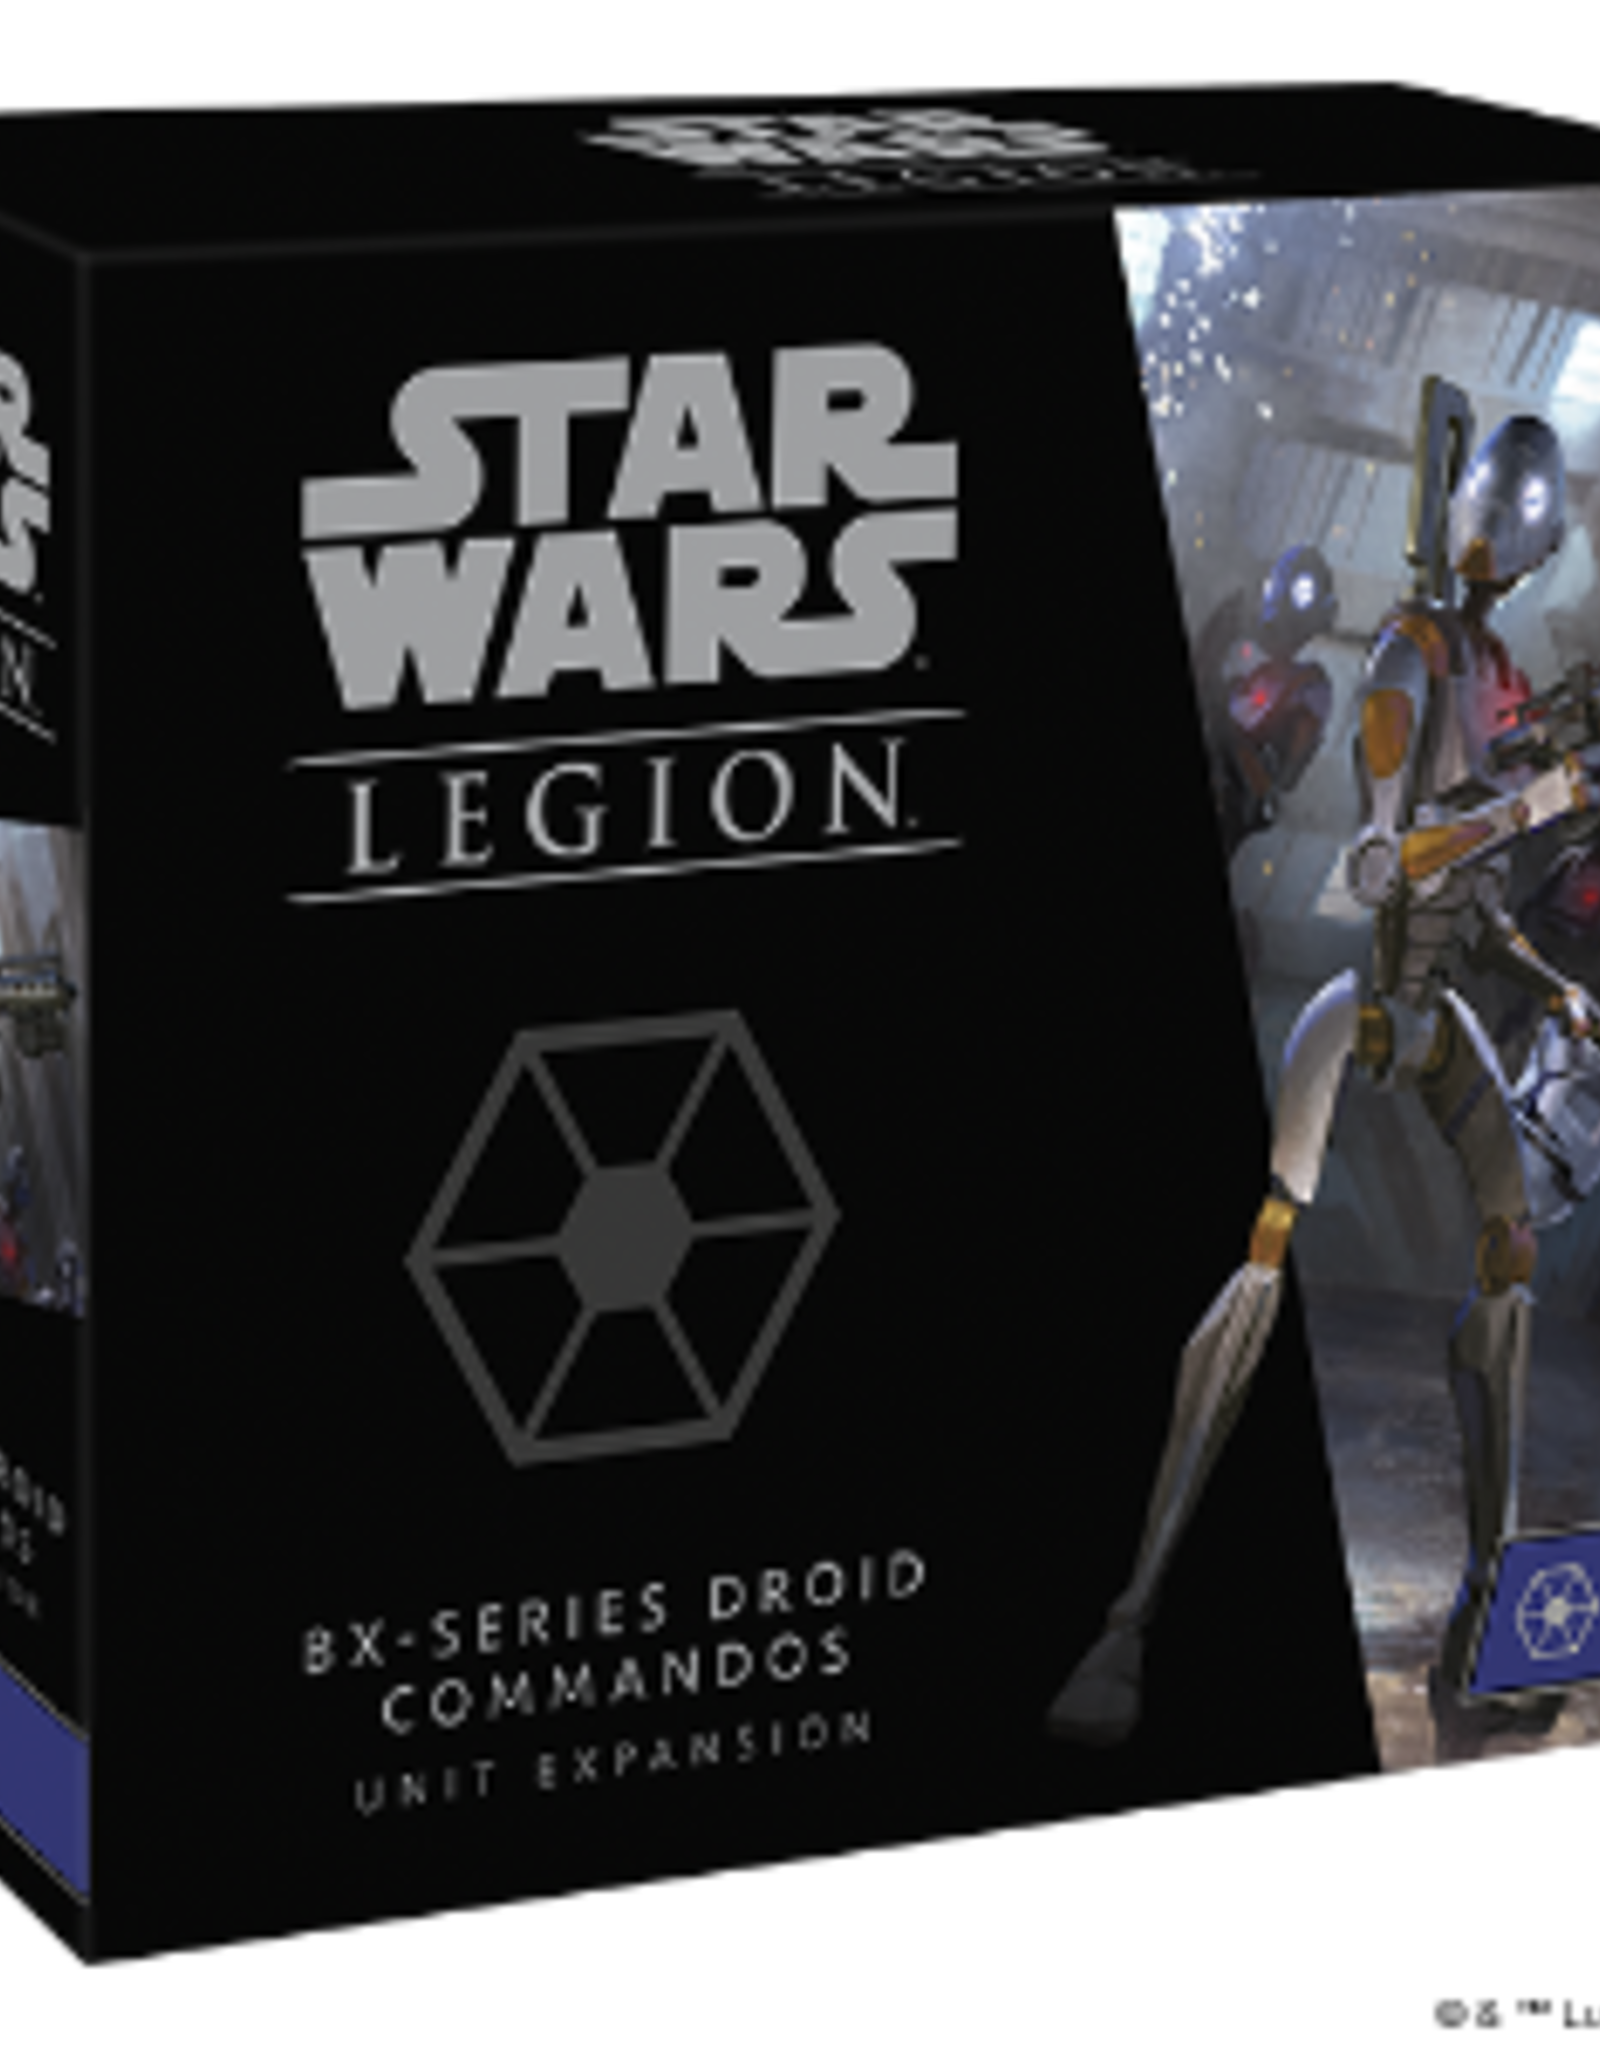 BX-Series Droid Commandos